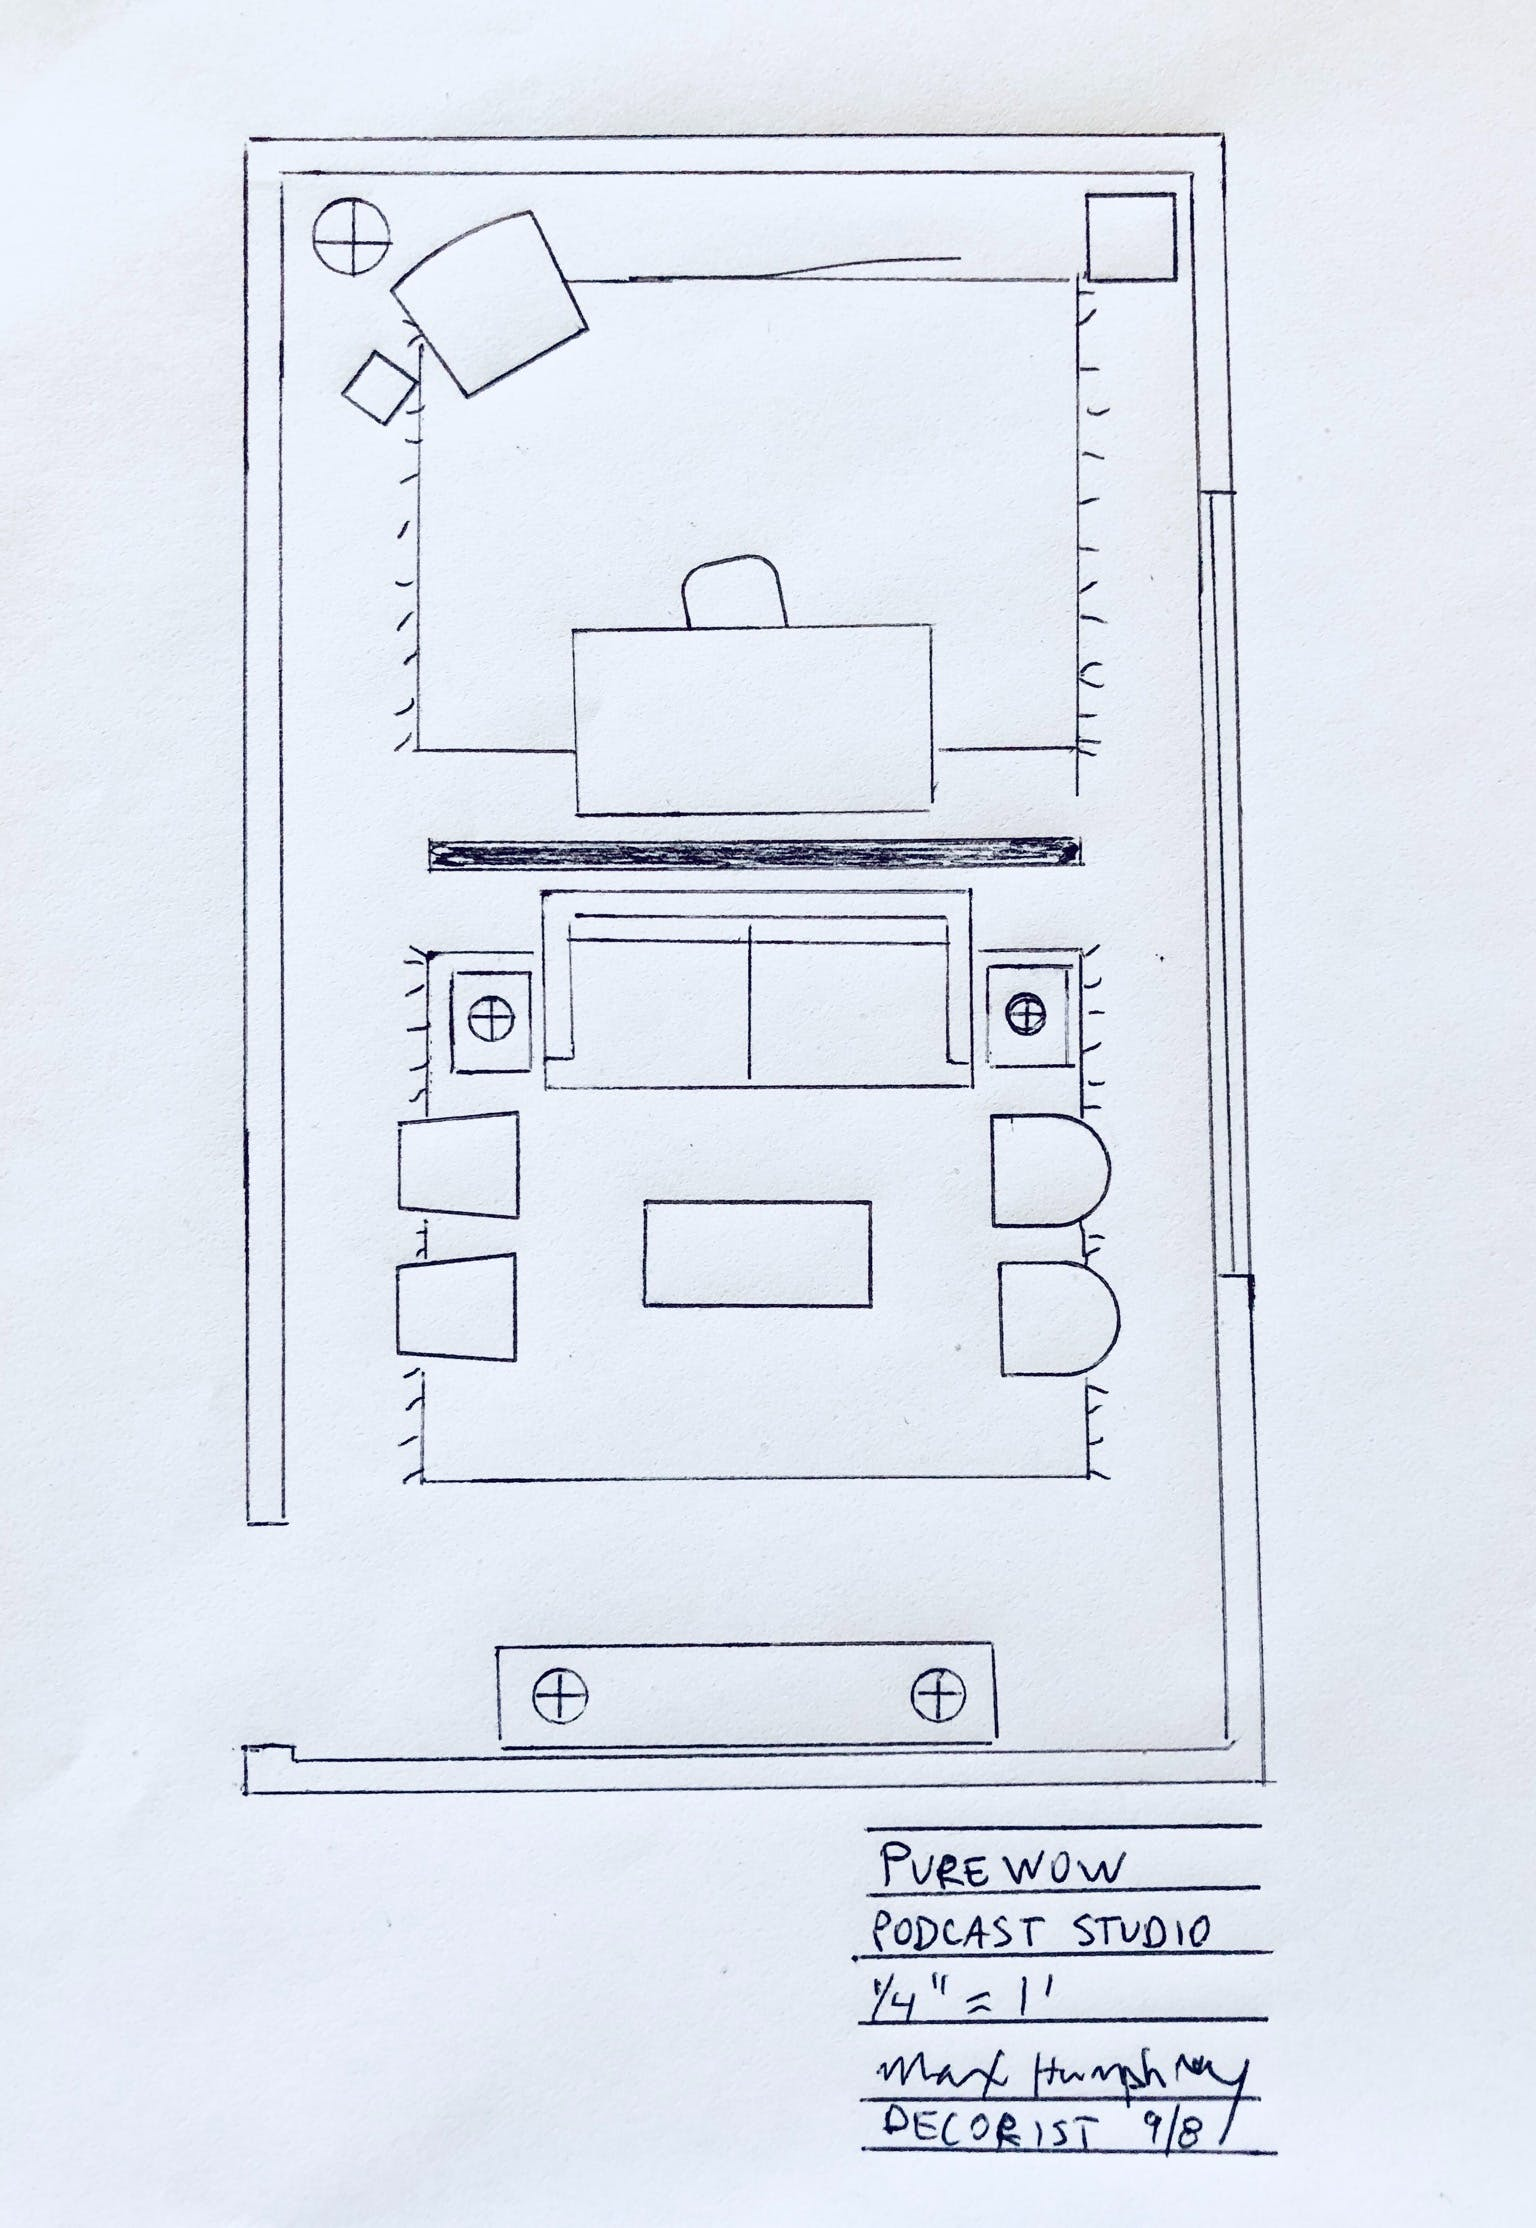 Purewow.floorplan